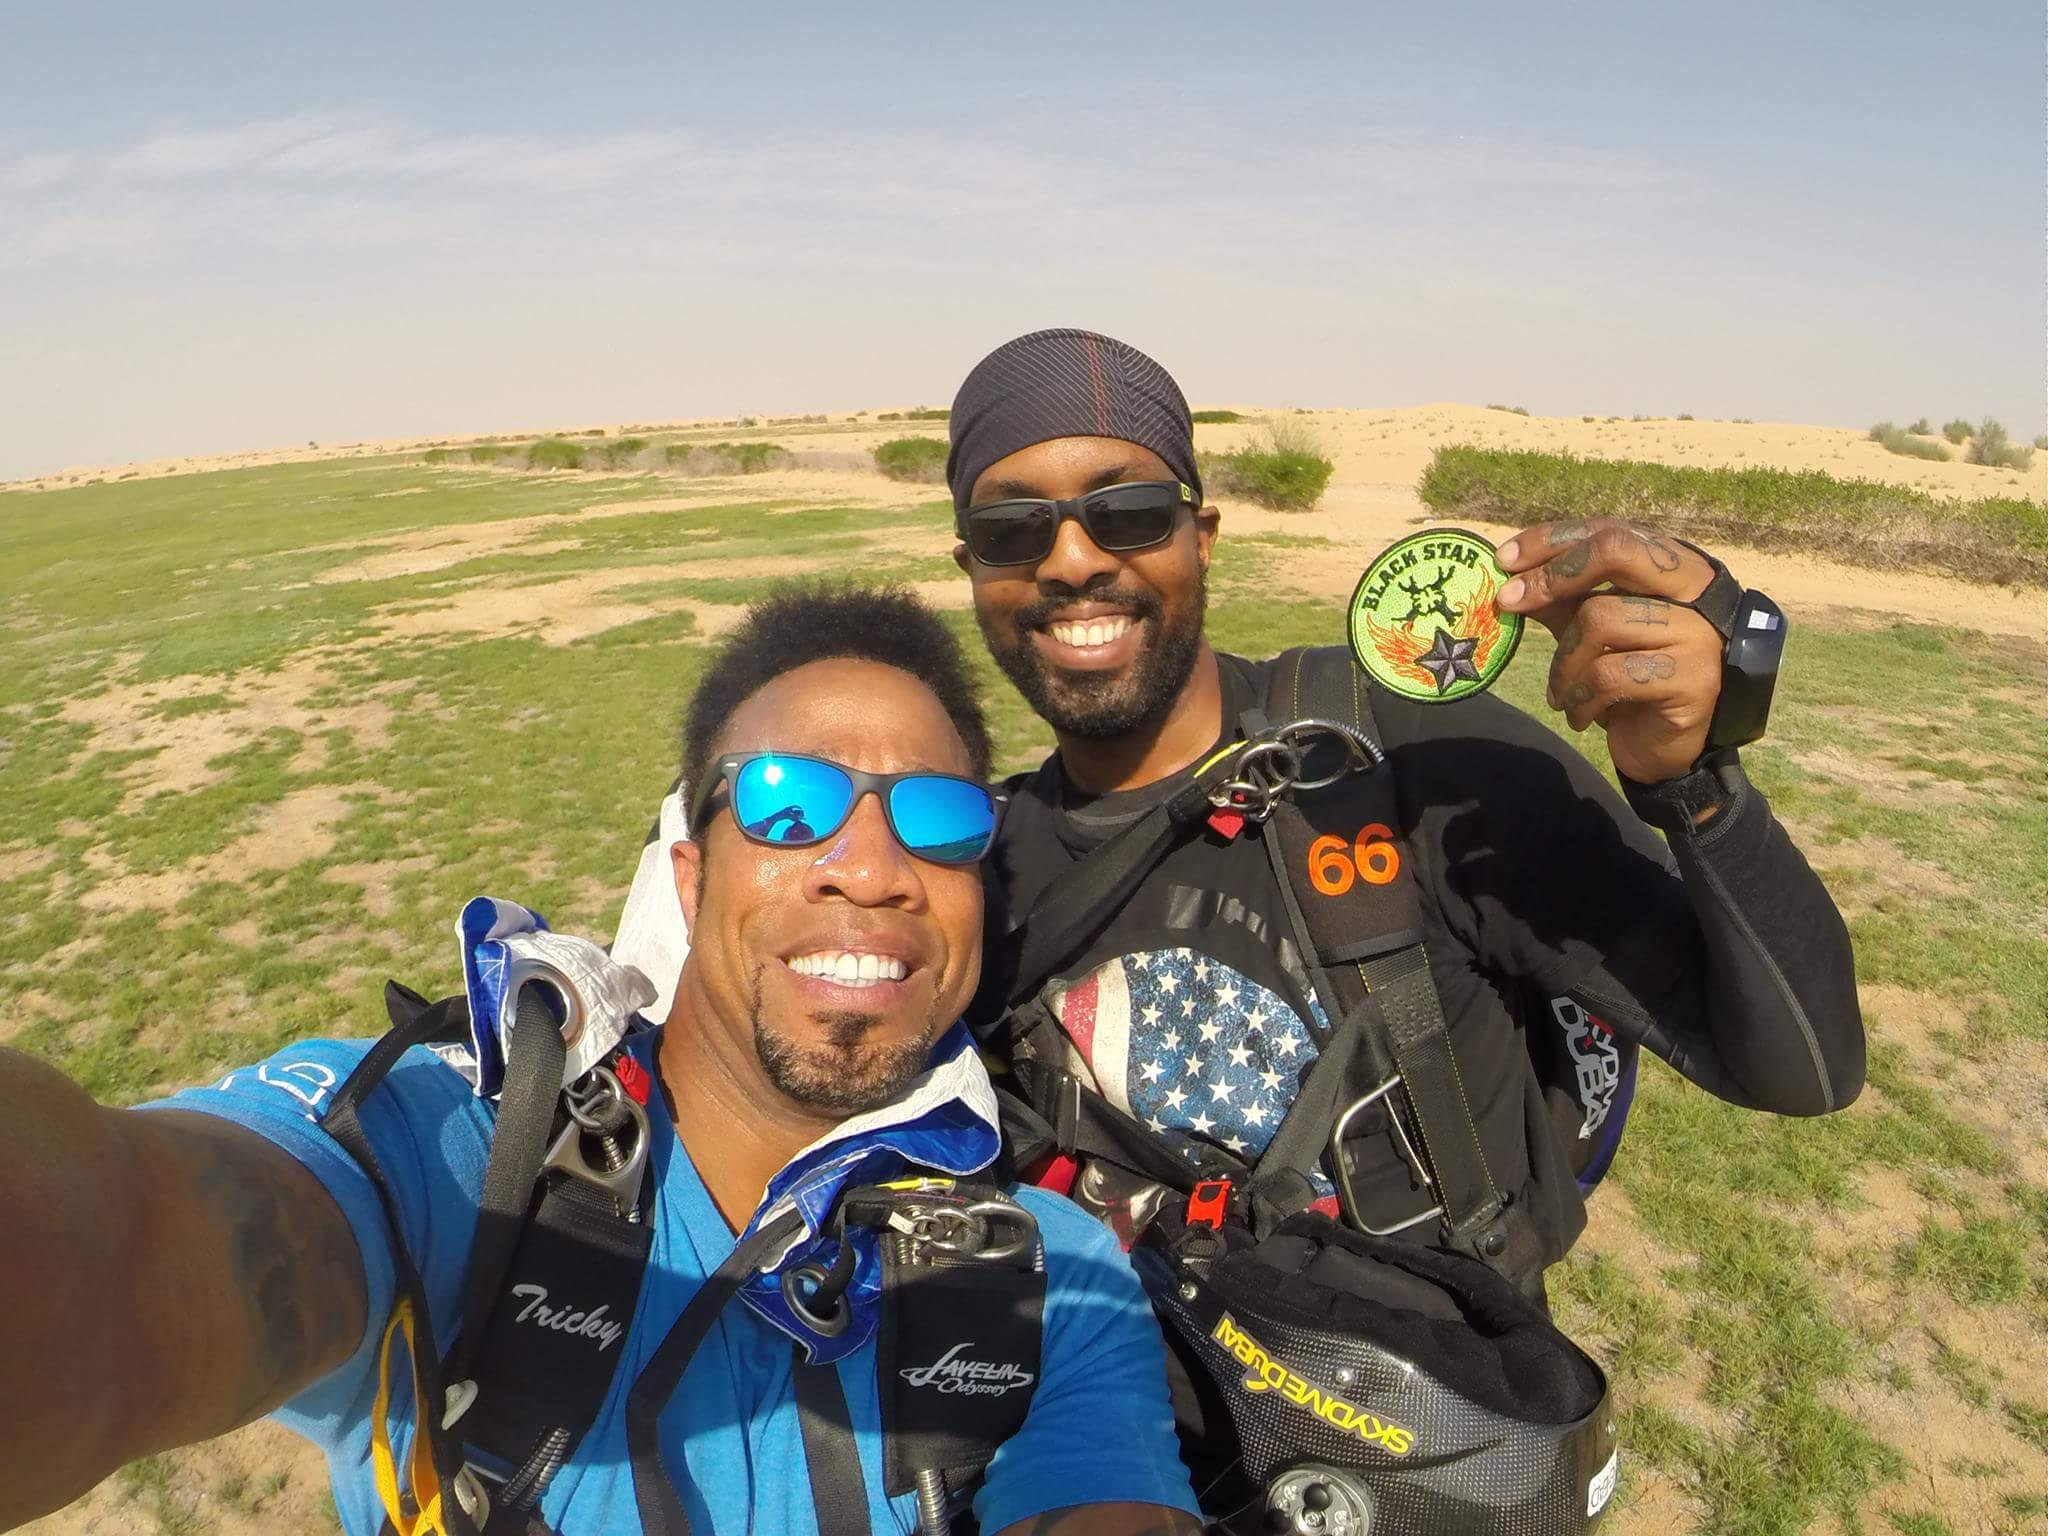 Team Blackstar Skydivers